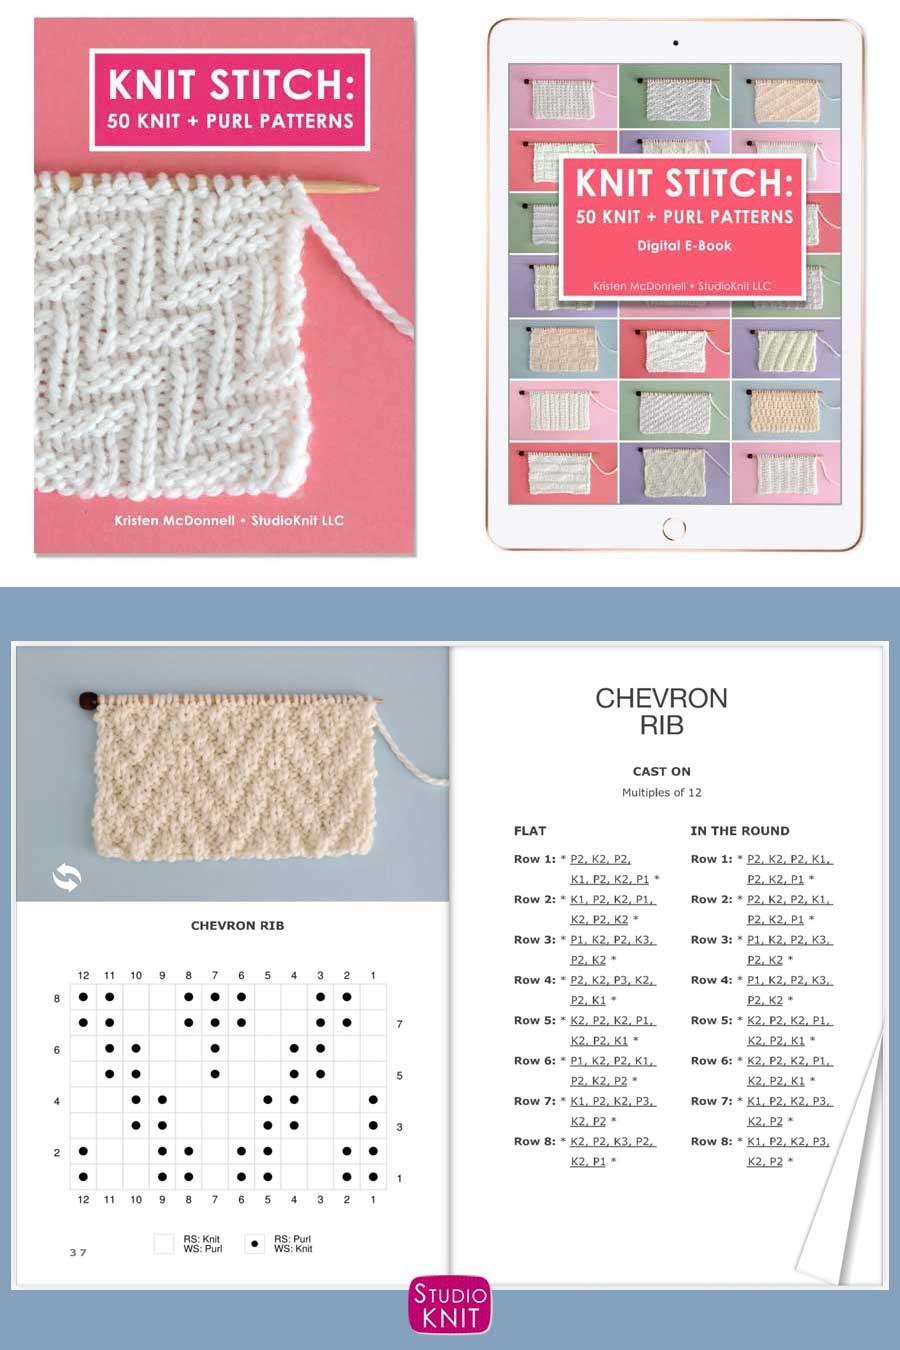 Knit Stitch Pattern Book with Chevron Rib Stitch